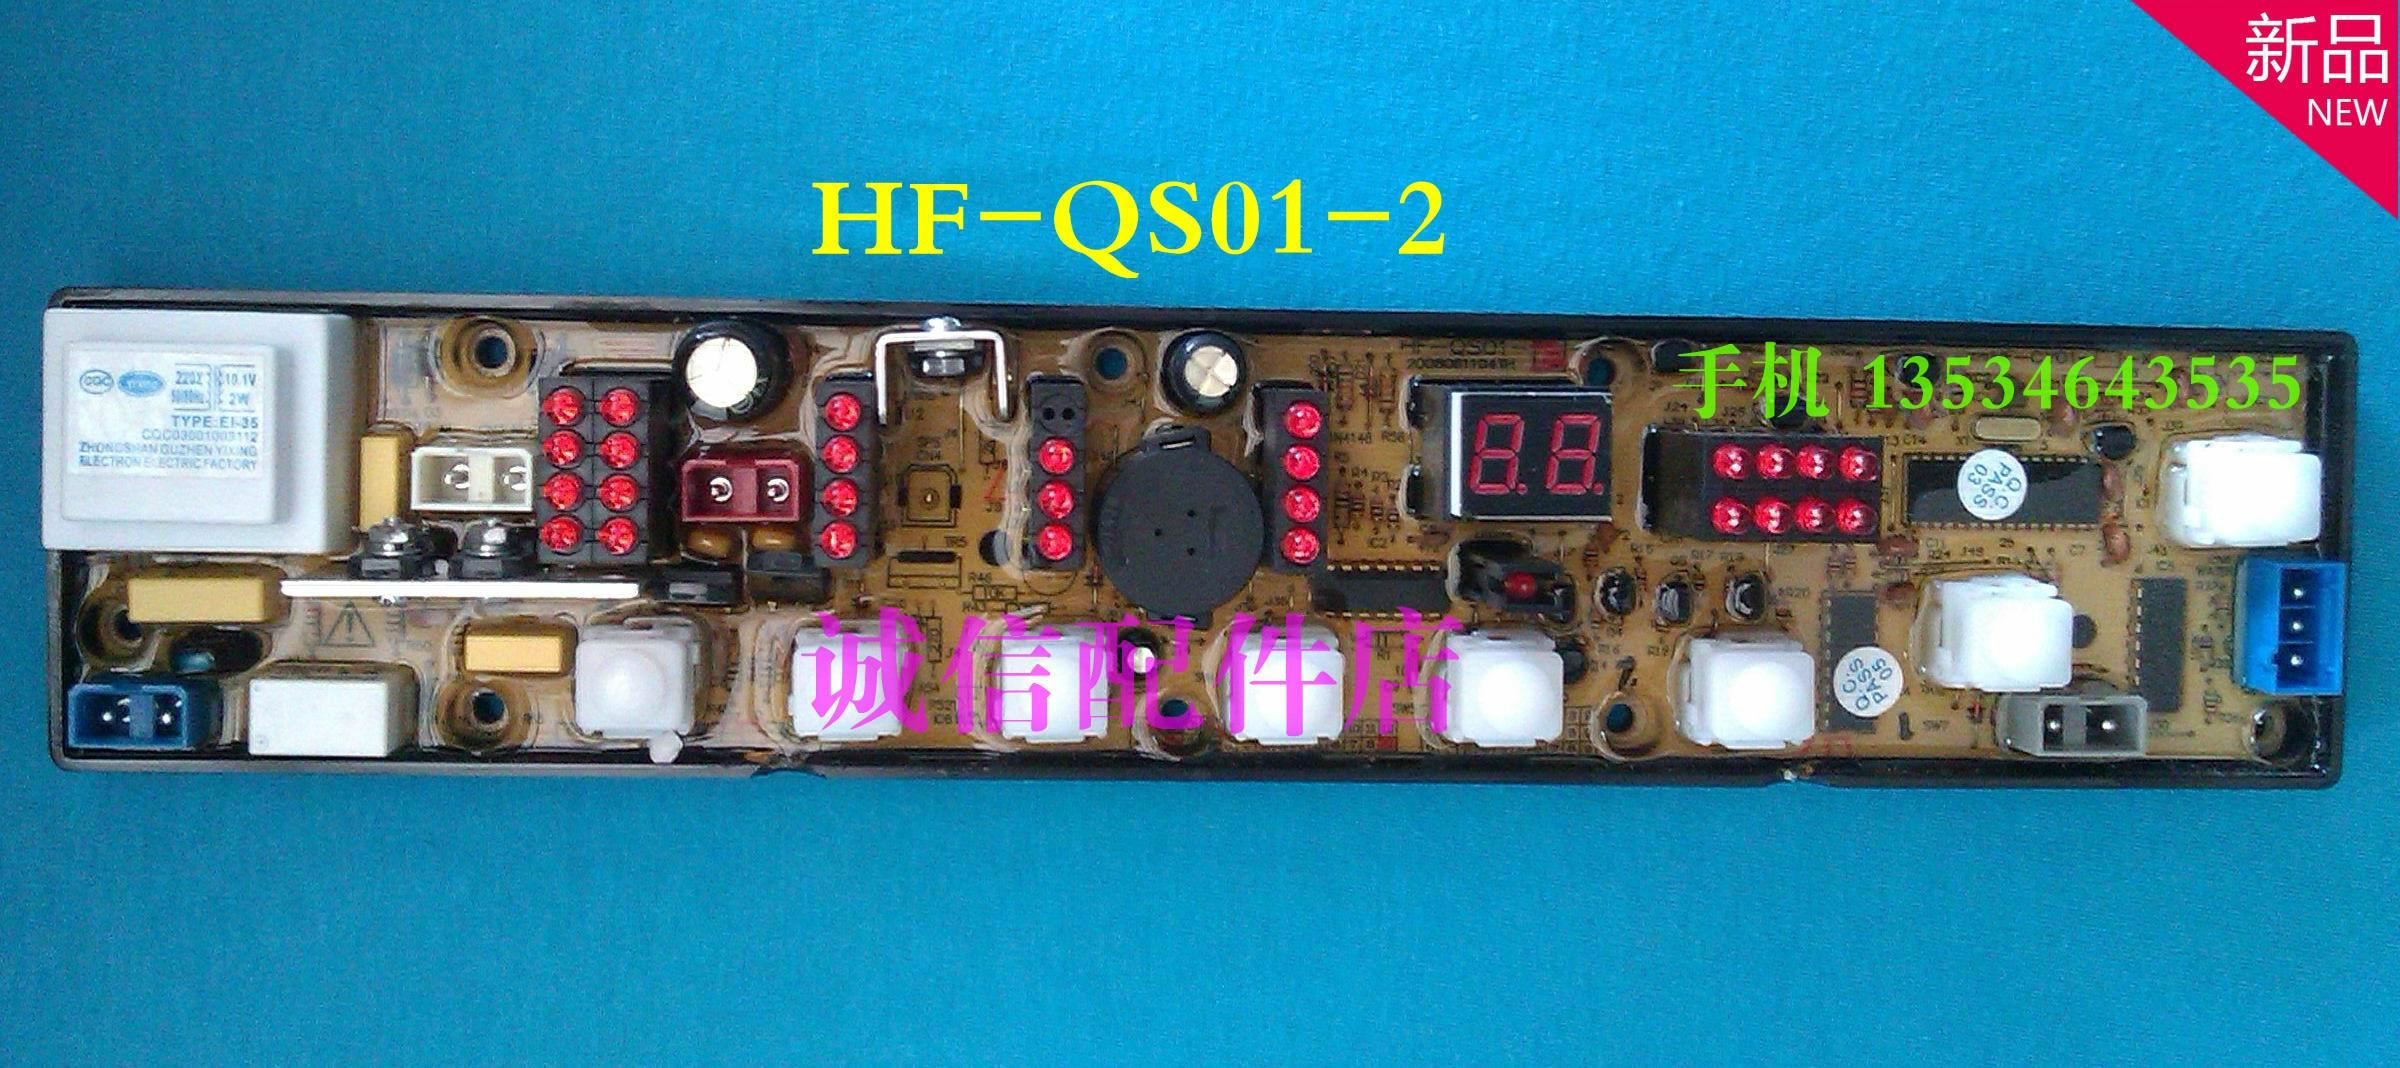 Washing machine board xqb65-6516a original motherboard hf-qs01-2 washing machine board xqb55 8960g xqb48 861 original motherboard hf 852 x